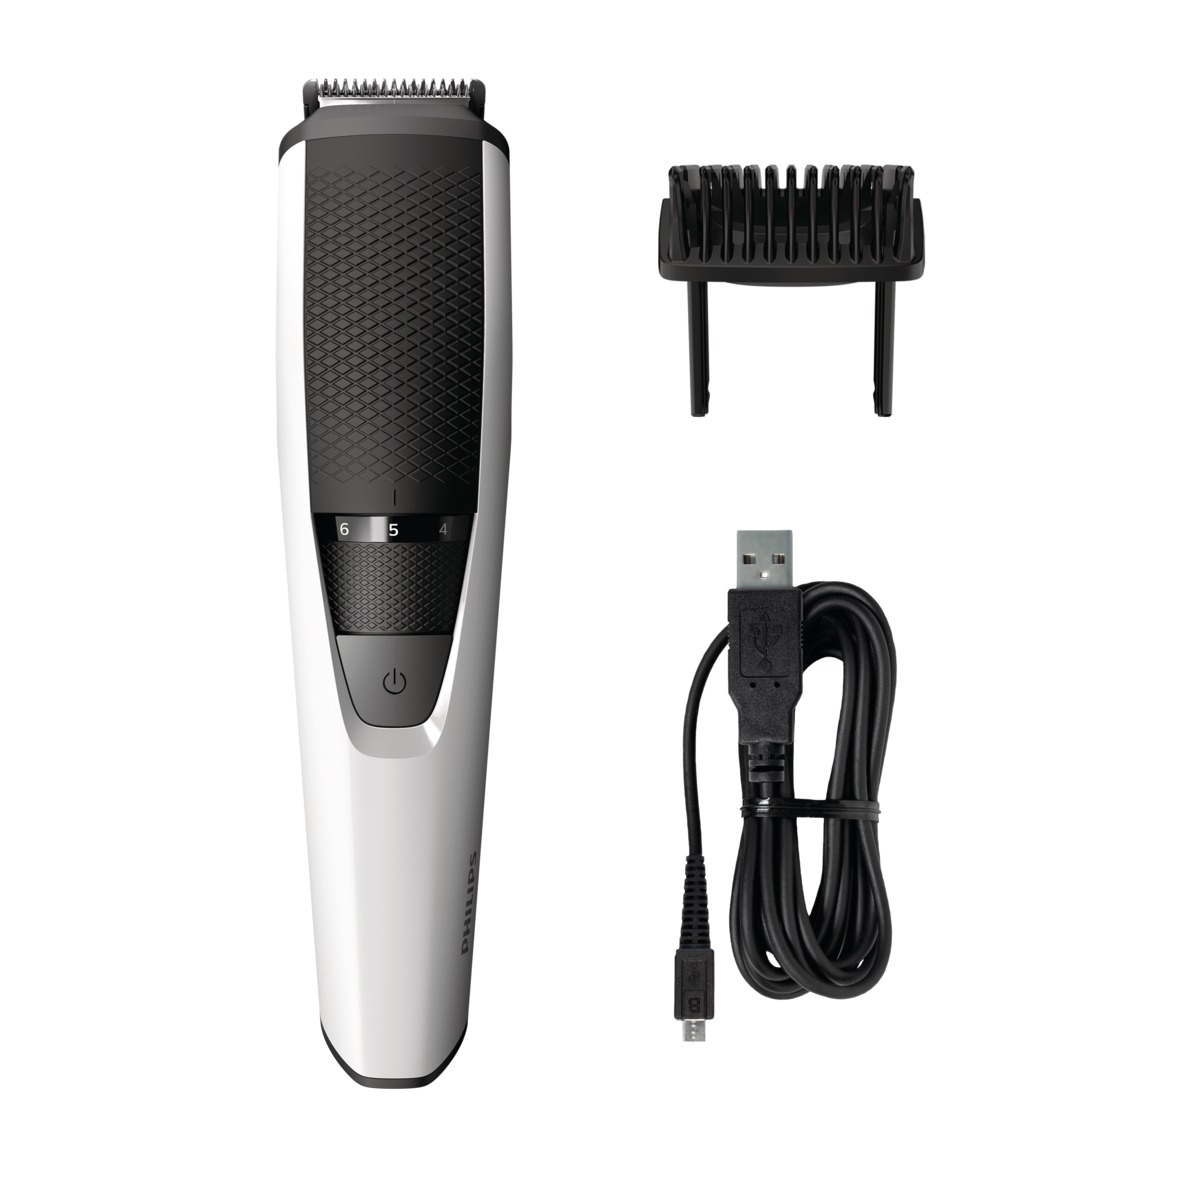 Philips Series 3000 BT3202/14, Silver Black триммер для бороды